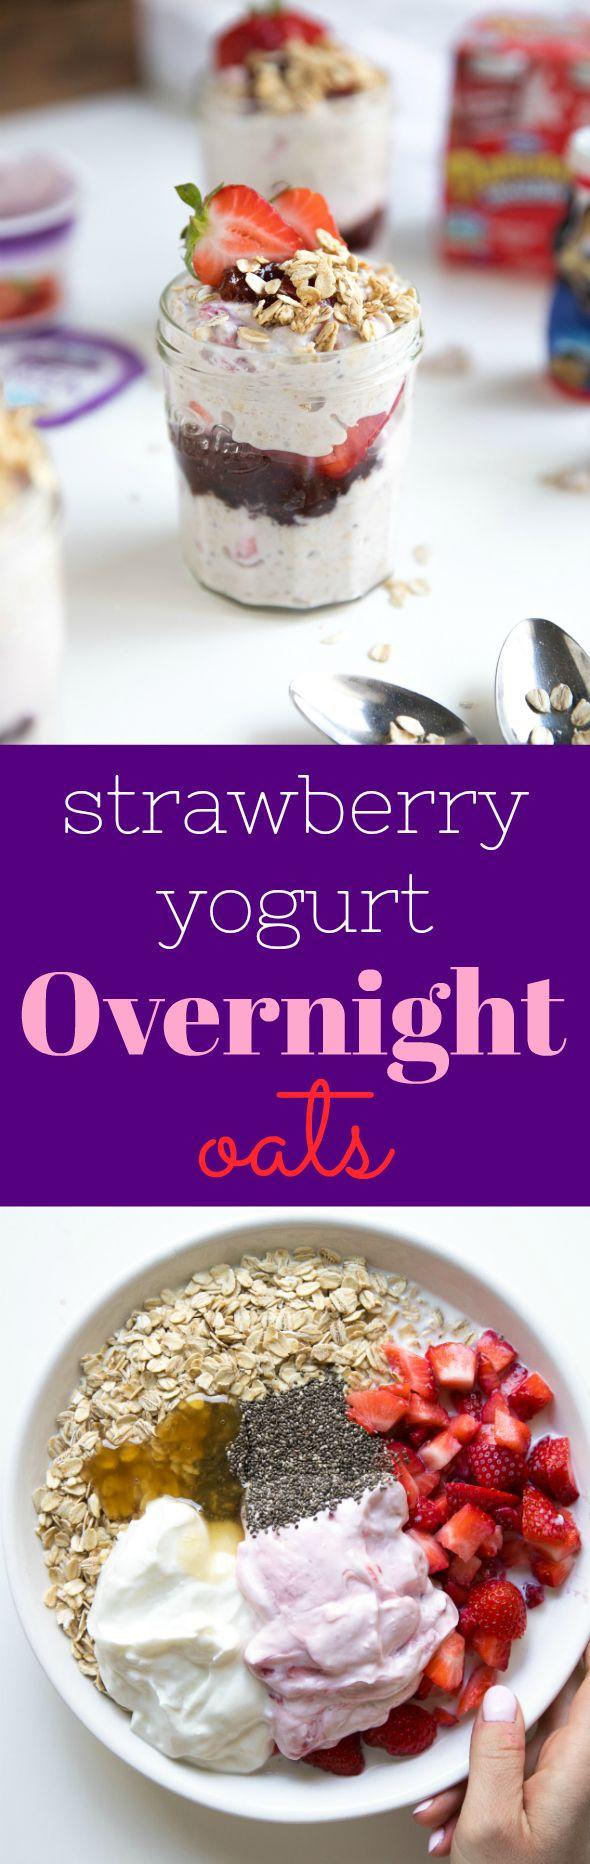 Easy Strawberry Yogurt Overnight Oats #ad #overnightoats #glutenfree #healthy #strawberries #breakfast #oatmeal #yogurt #chiaseeds #vegetarian